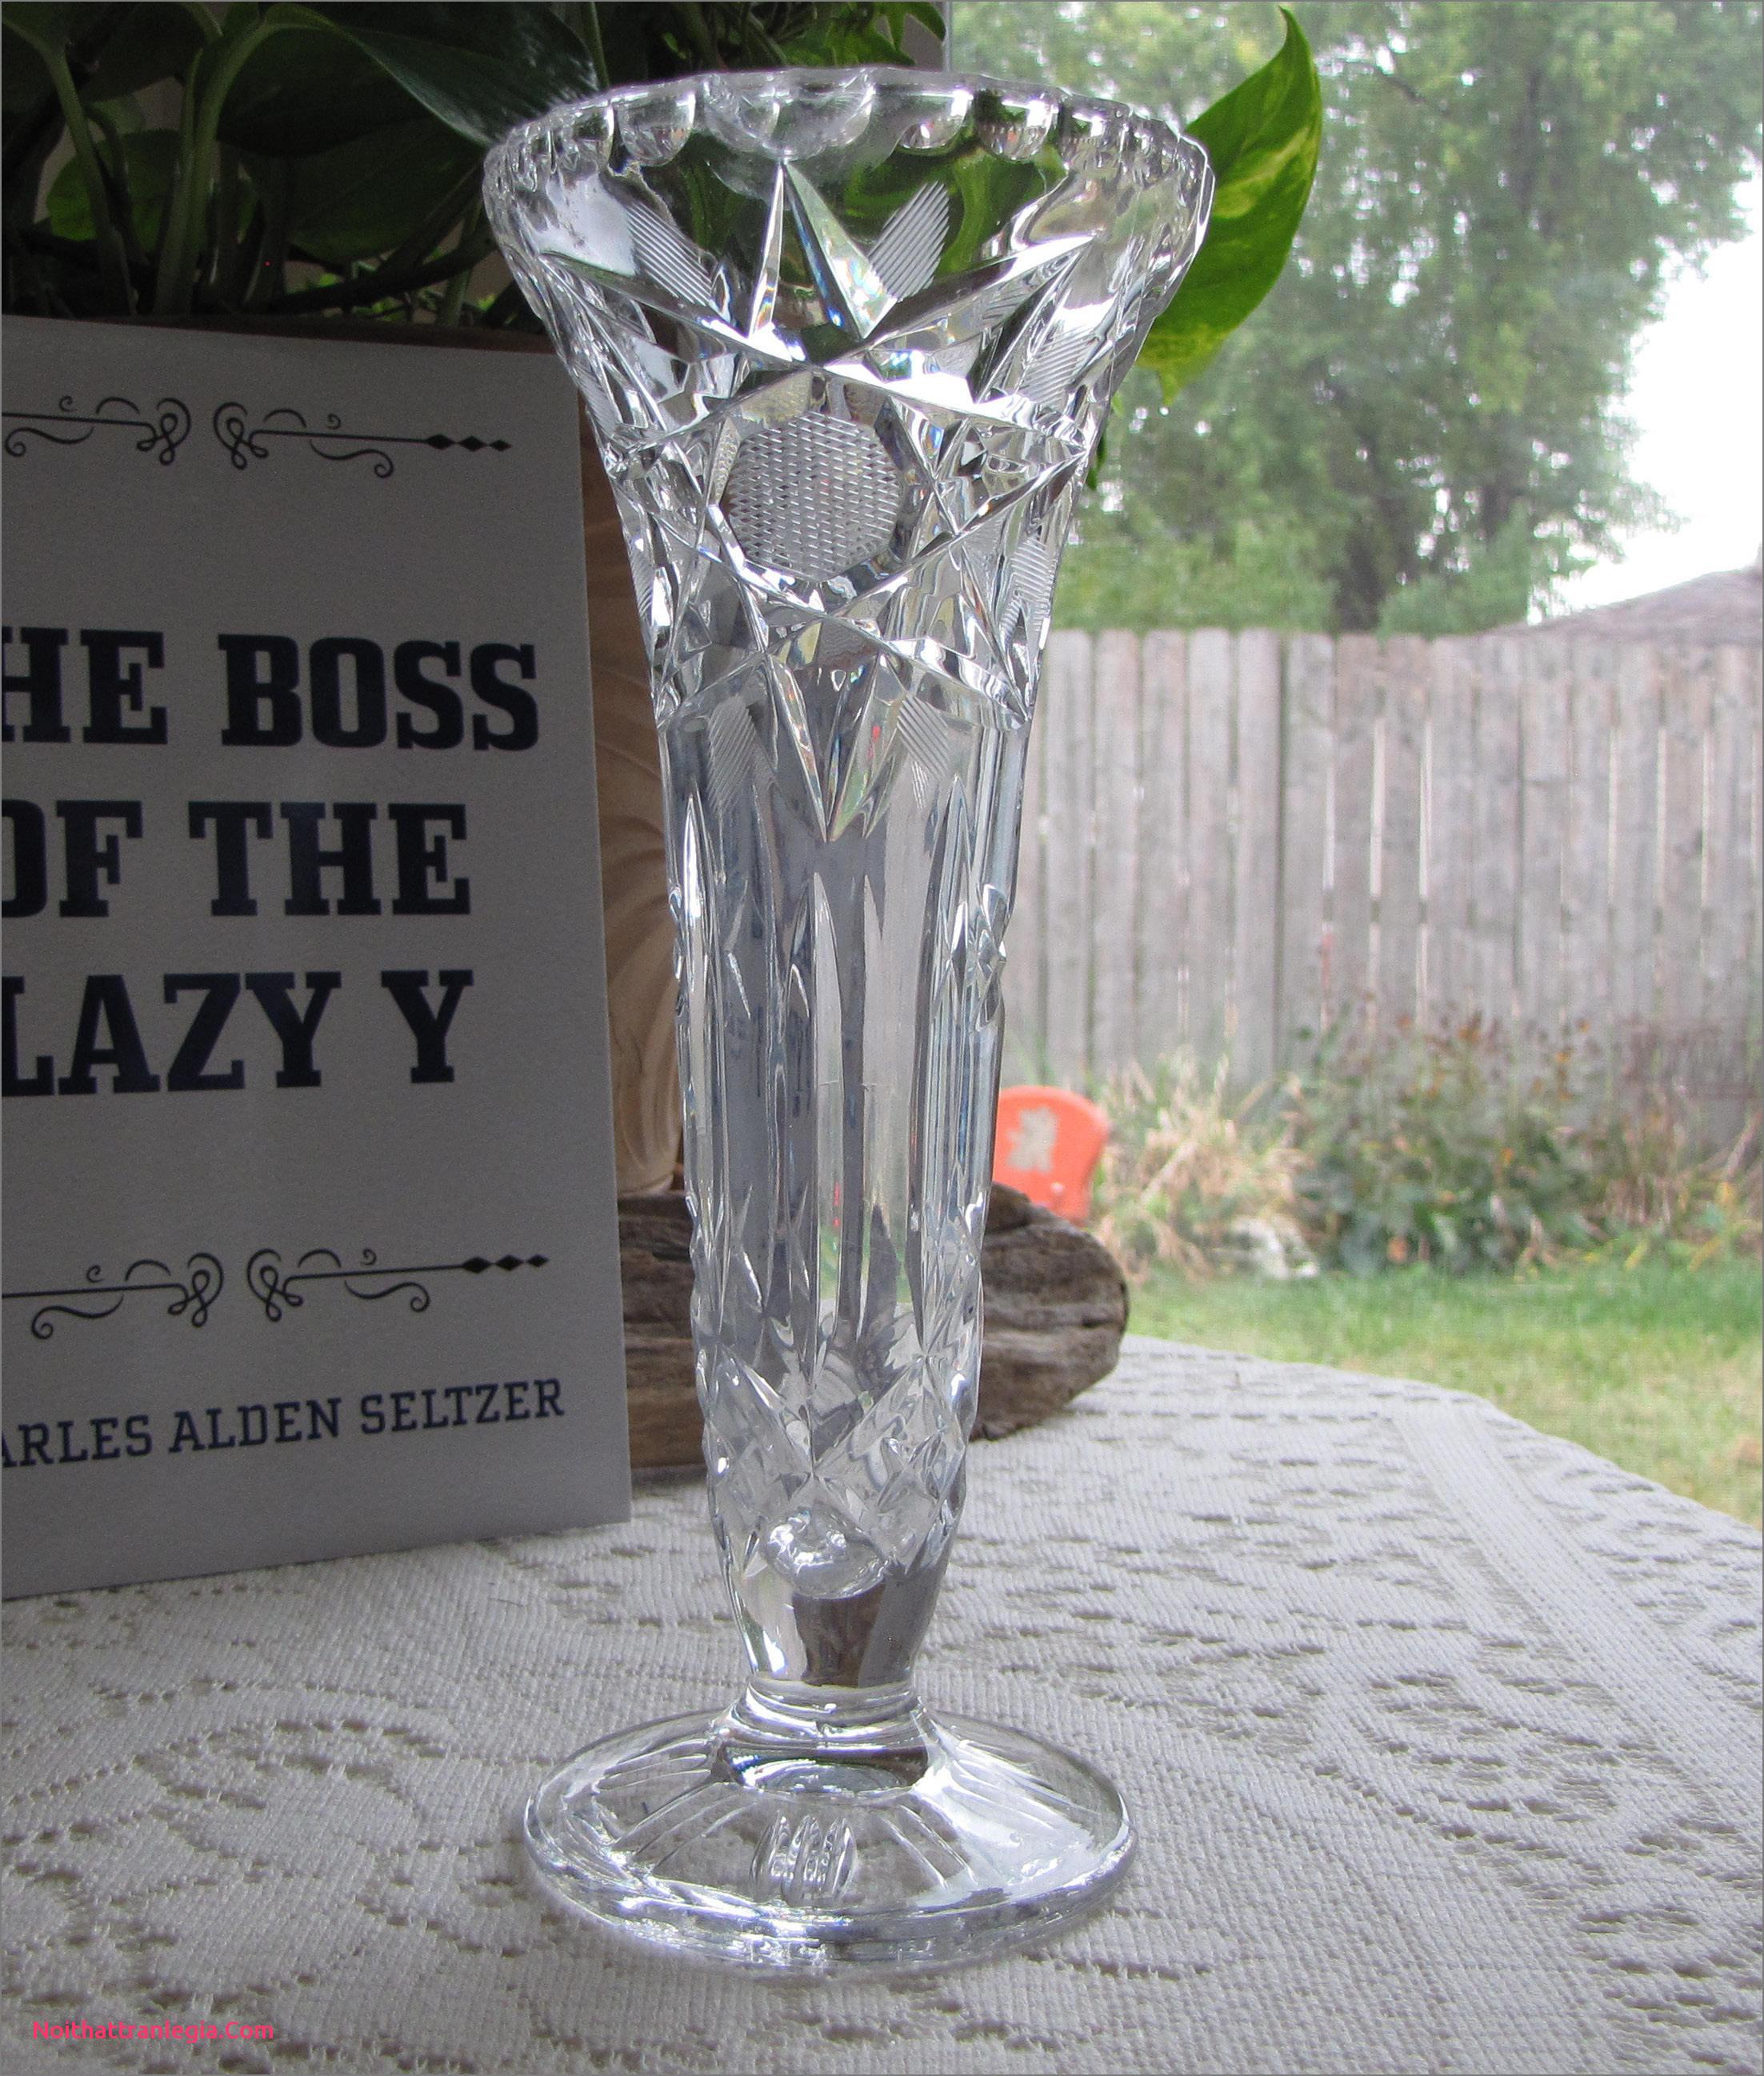 antique crystal vases value of 20 cut glass antique vase noithattranlegia vases design within gallery photo gallery photo gallery photo crystal vase